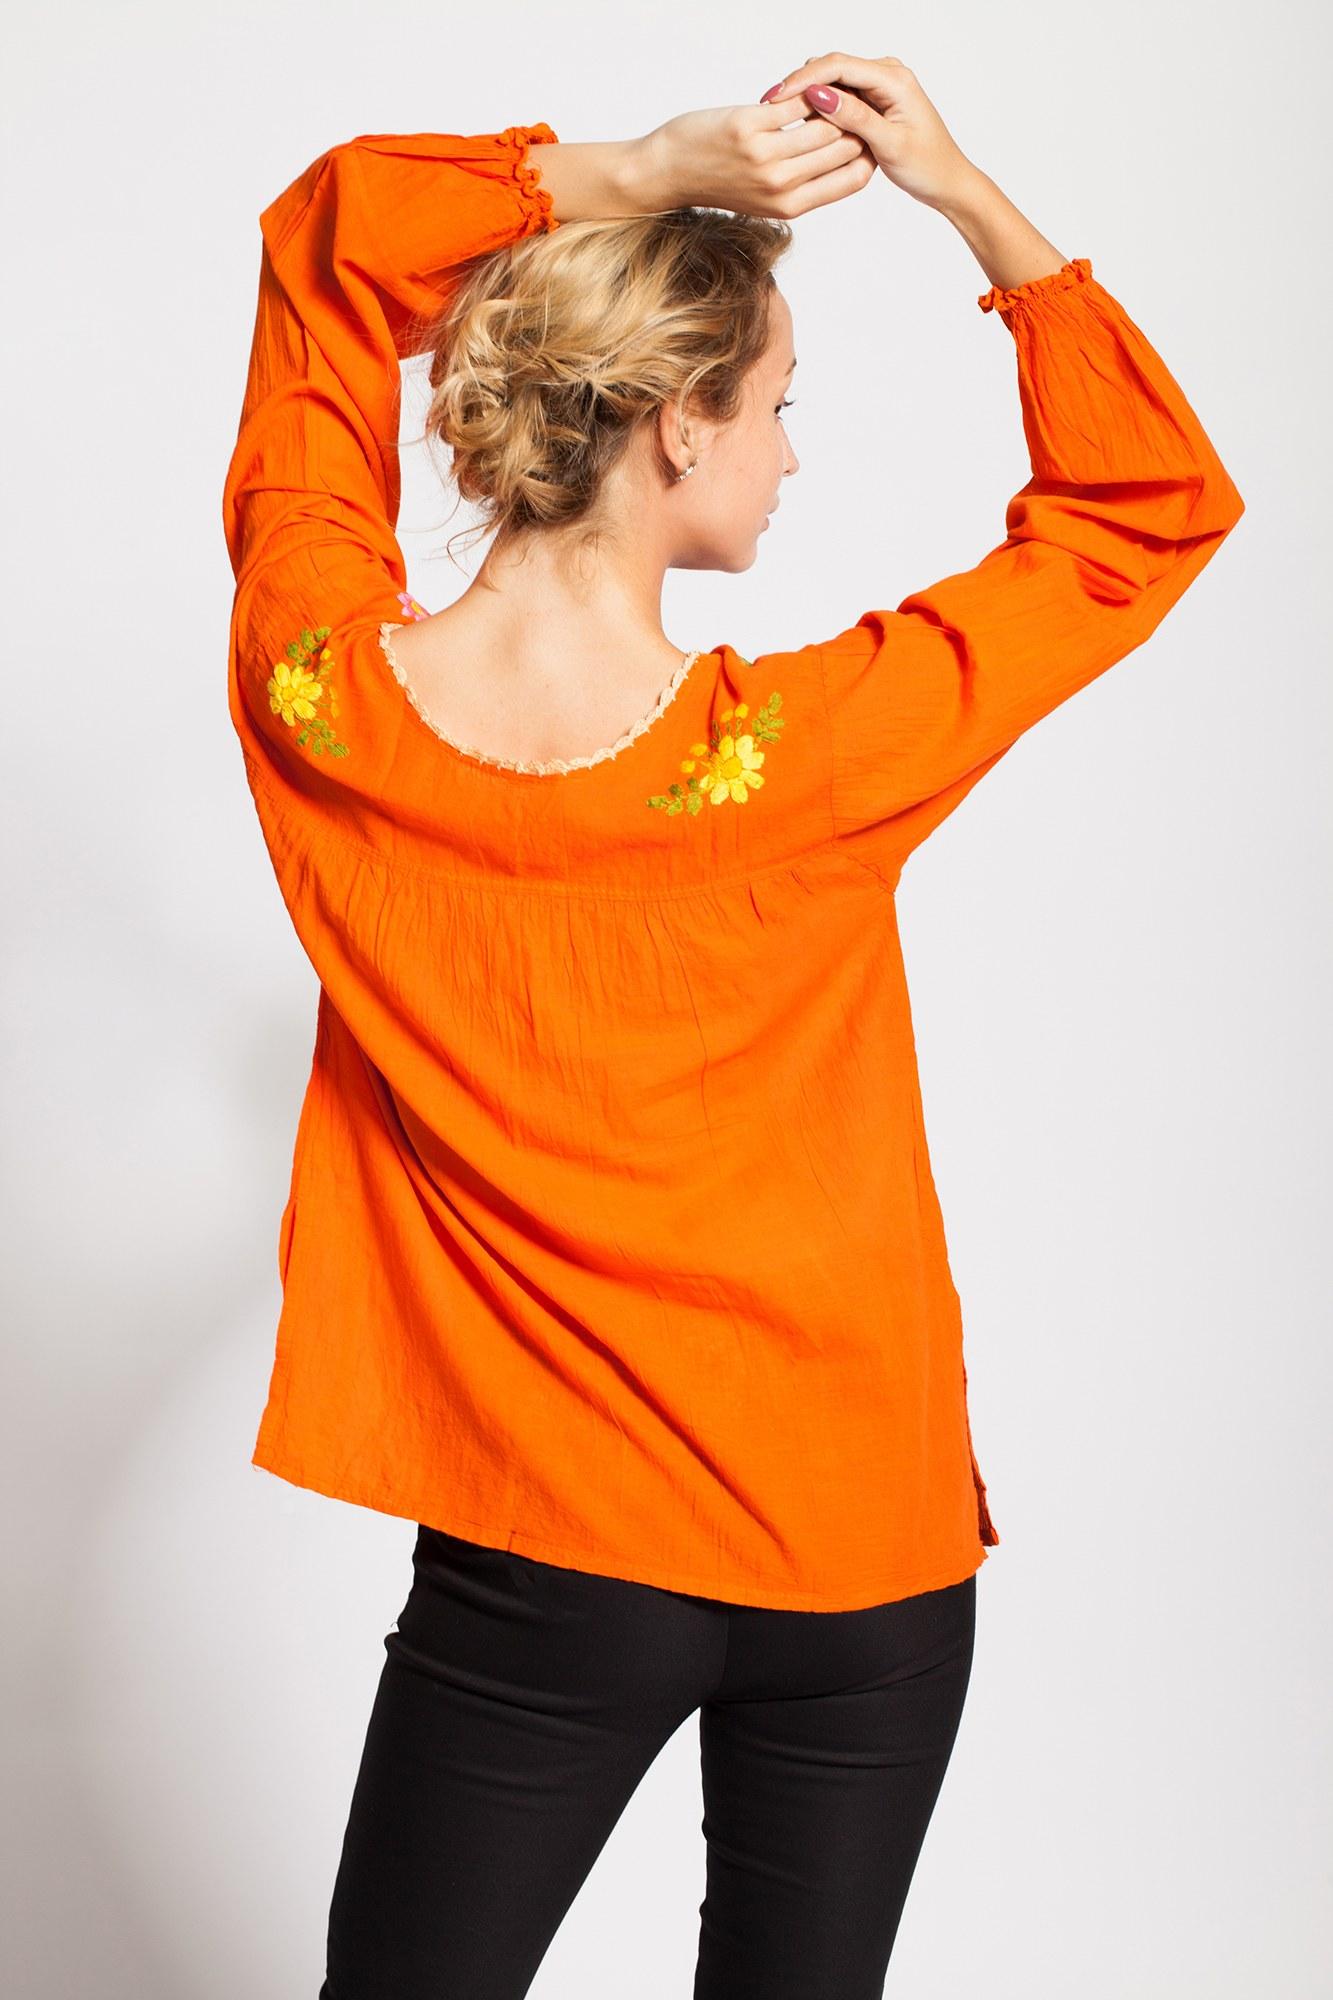 Bluza portocalie tip iie brodata manual